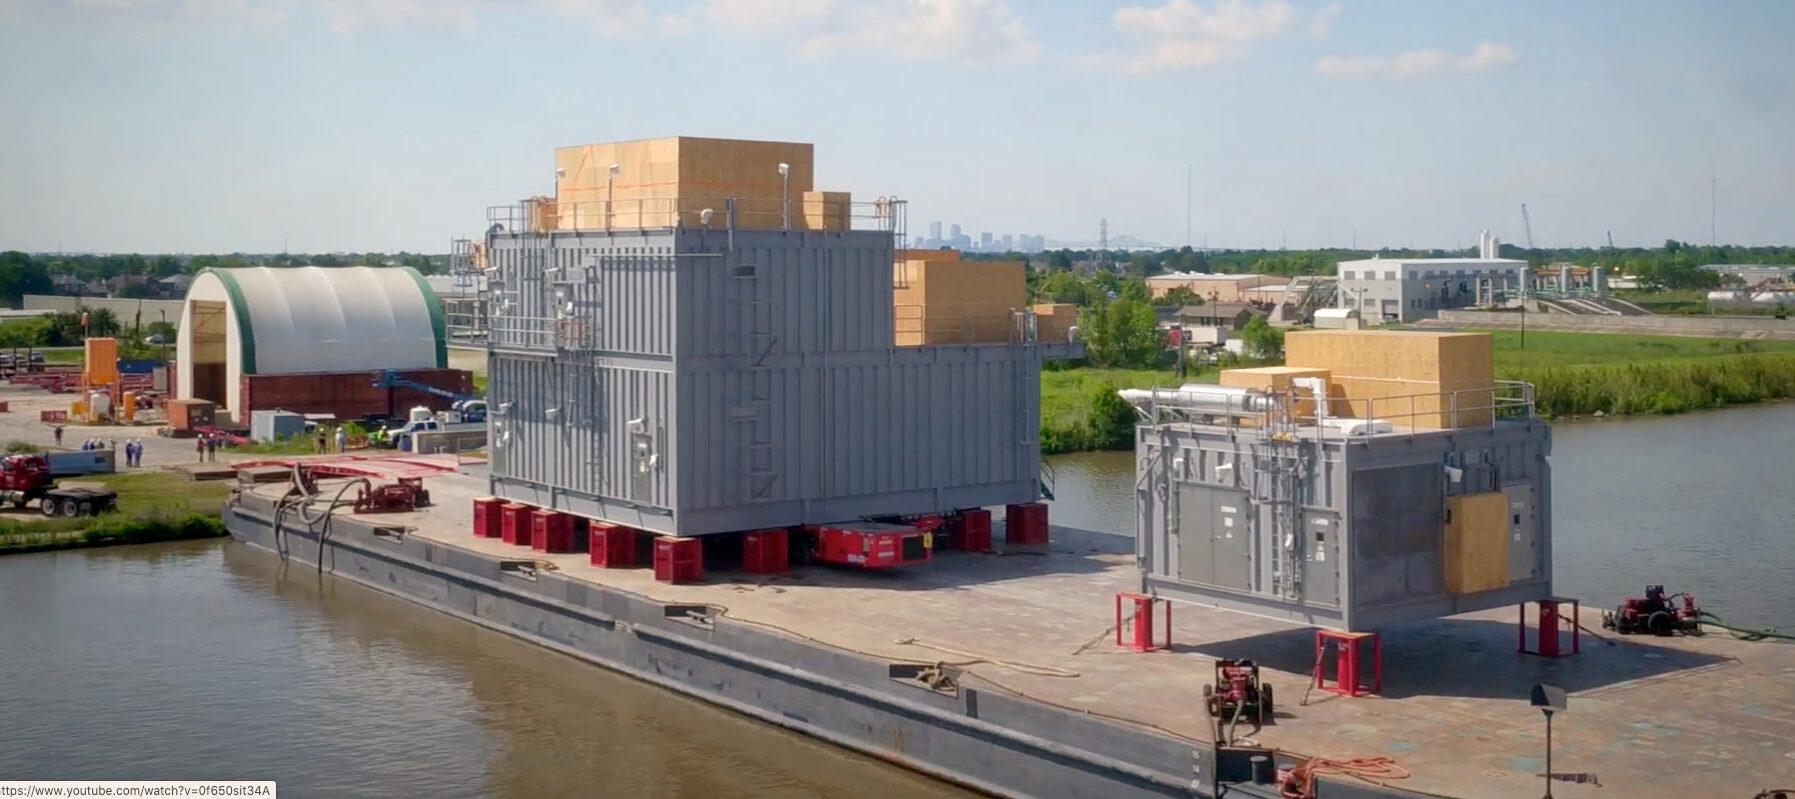 Shell Vito Power Control Distribution Building Loading